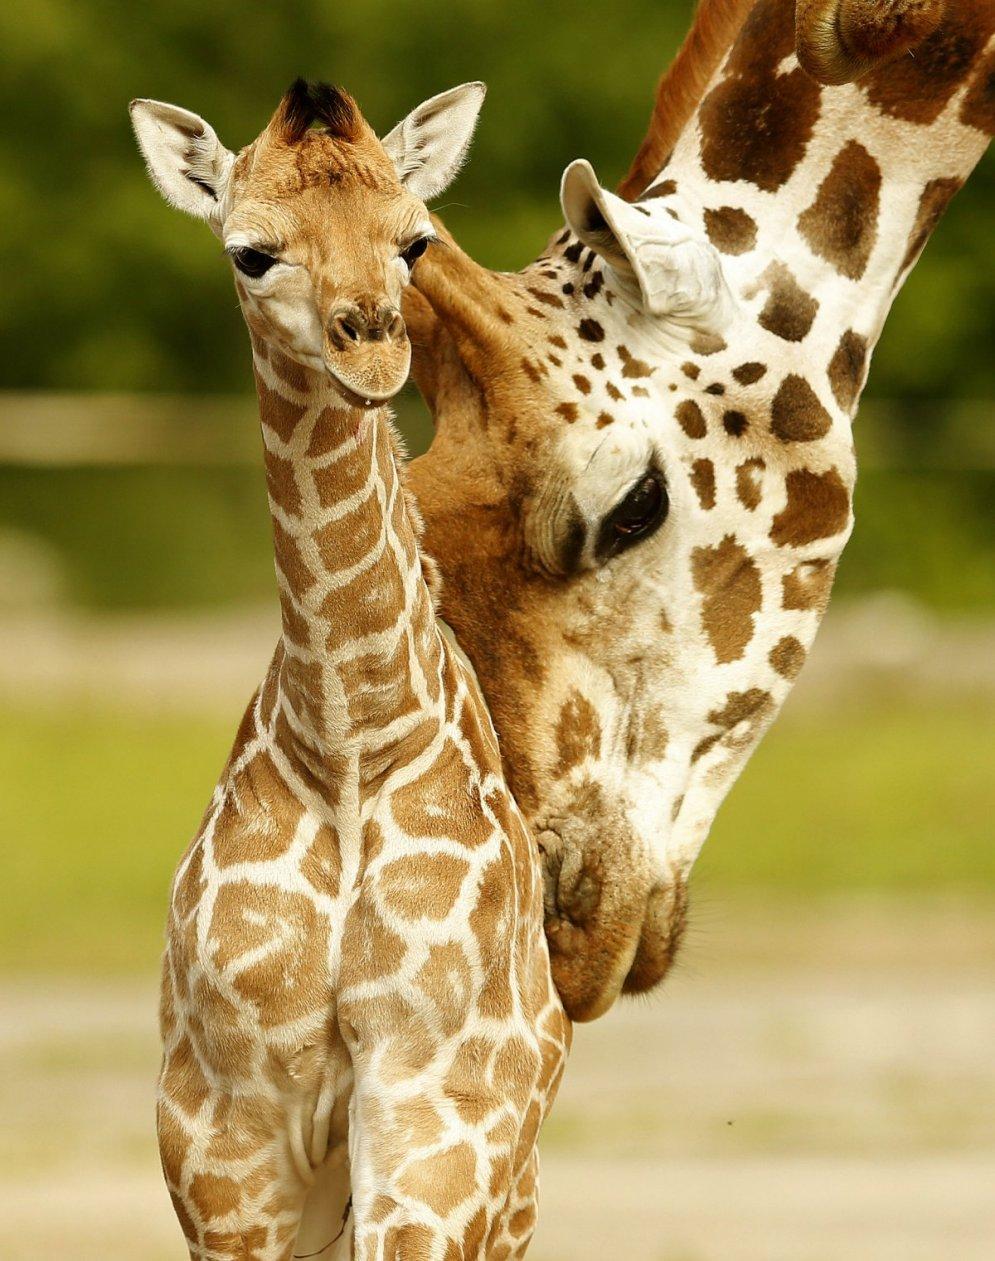 человек фотки и картинки жирафа нечасто, иногда